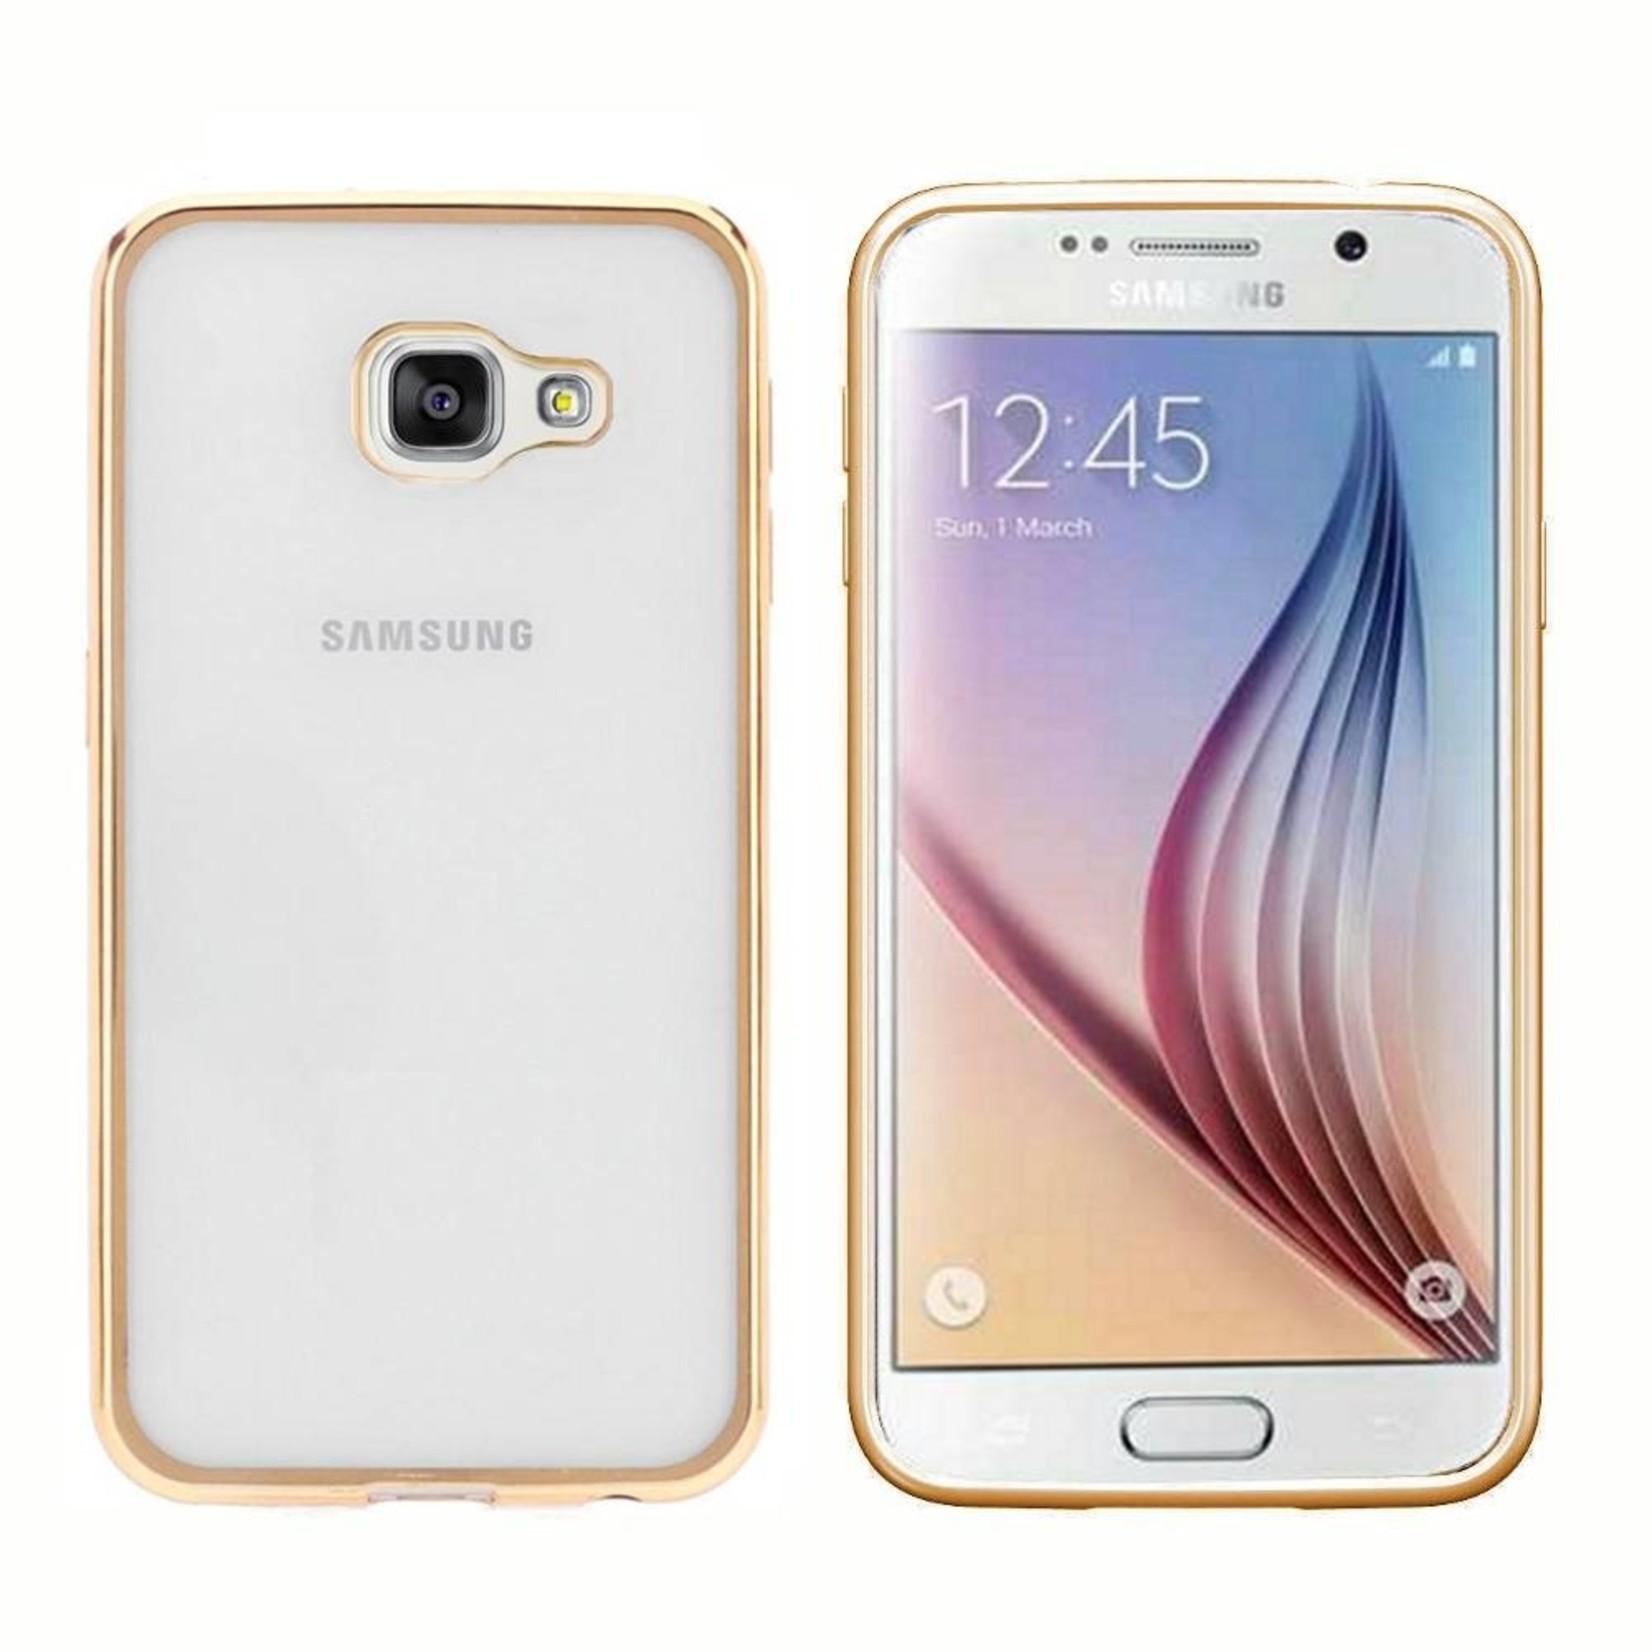 Colorfone Hoesje CoolSkin Bumper Clear Samsung A7 2016 Goud